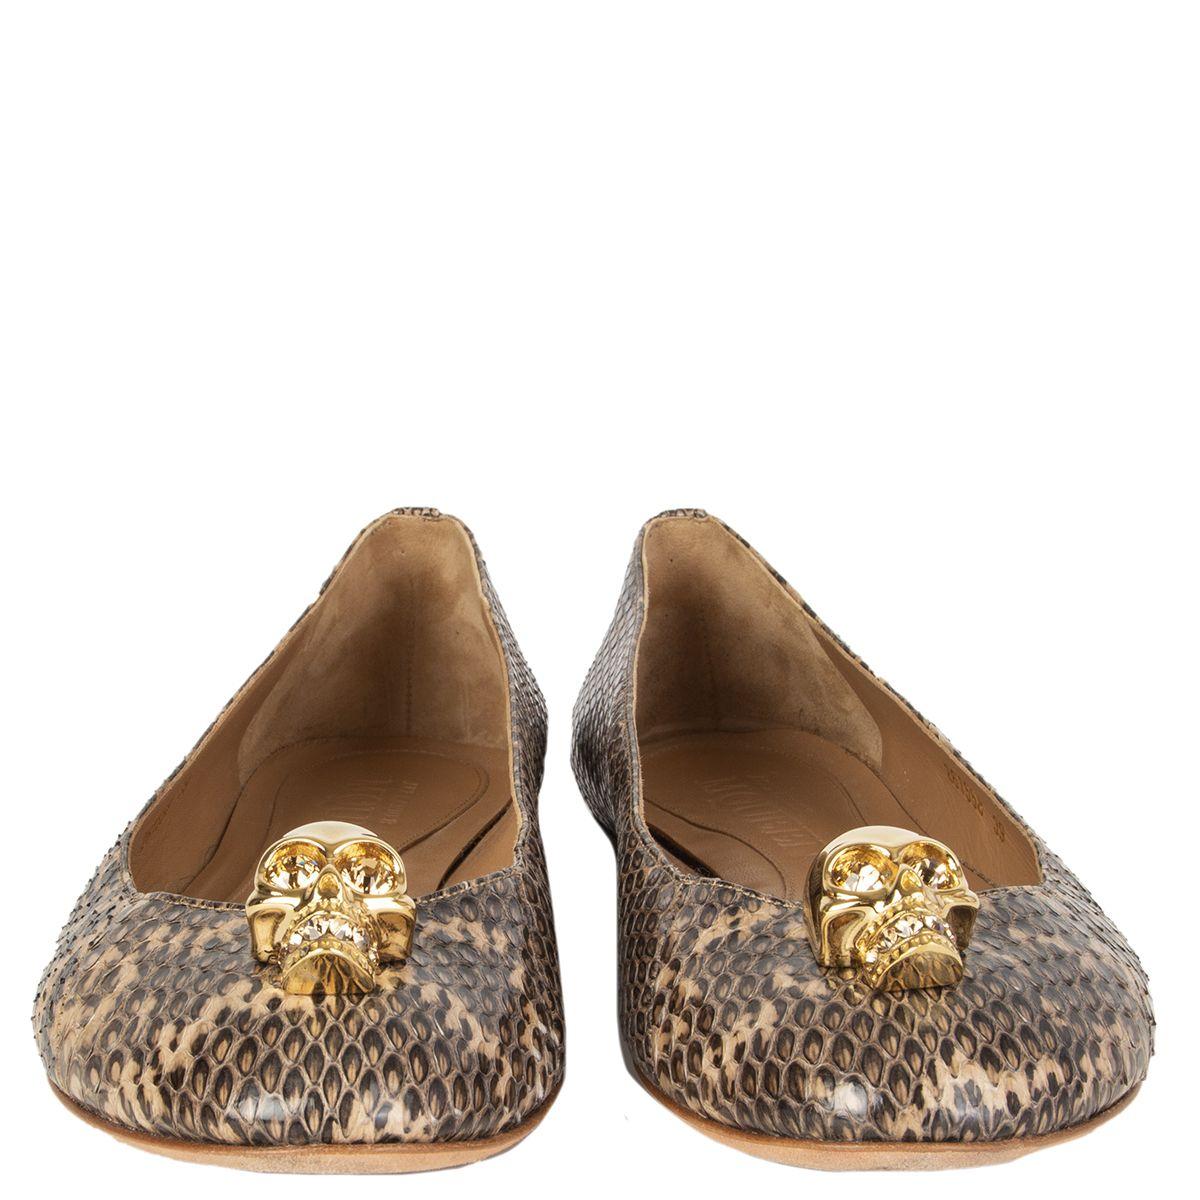 New Alexander McQueen 497795 Metallic Gold Leather SKULL Ballet Flats Shoes